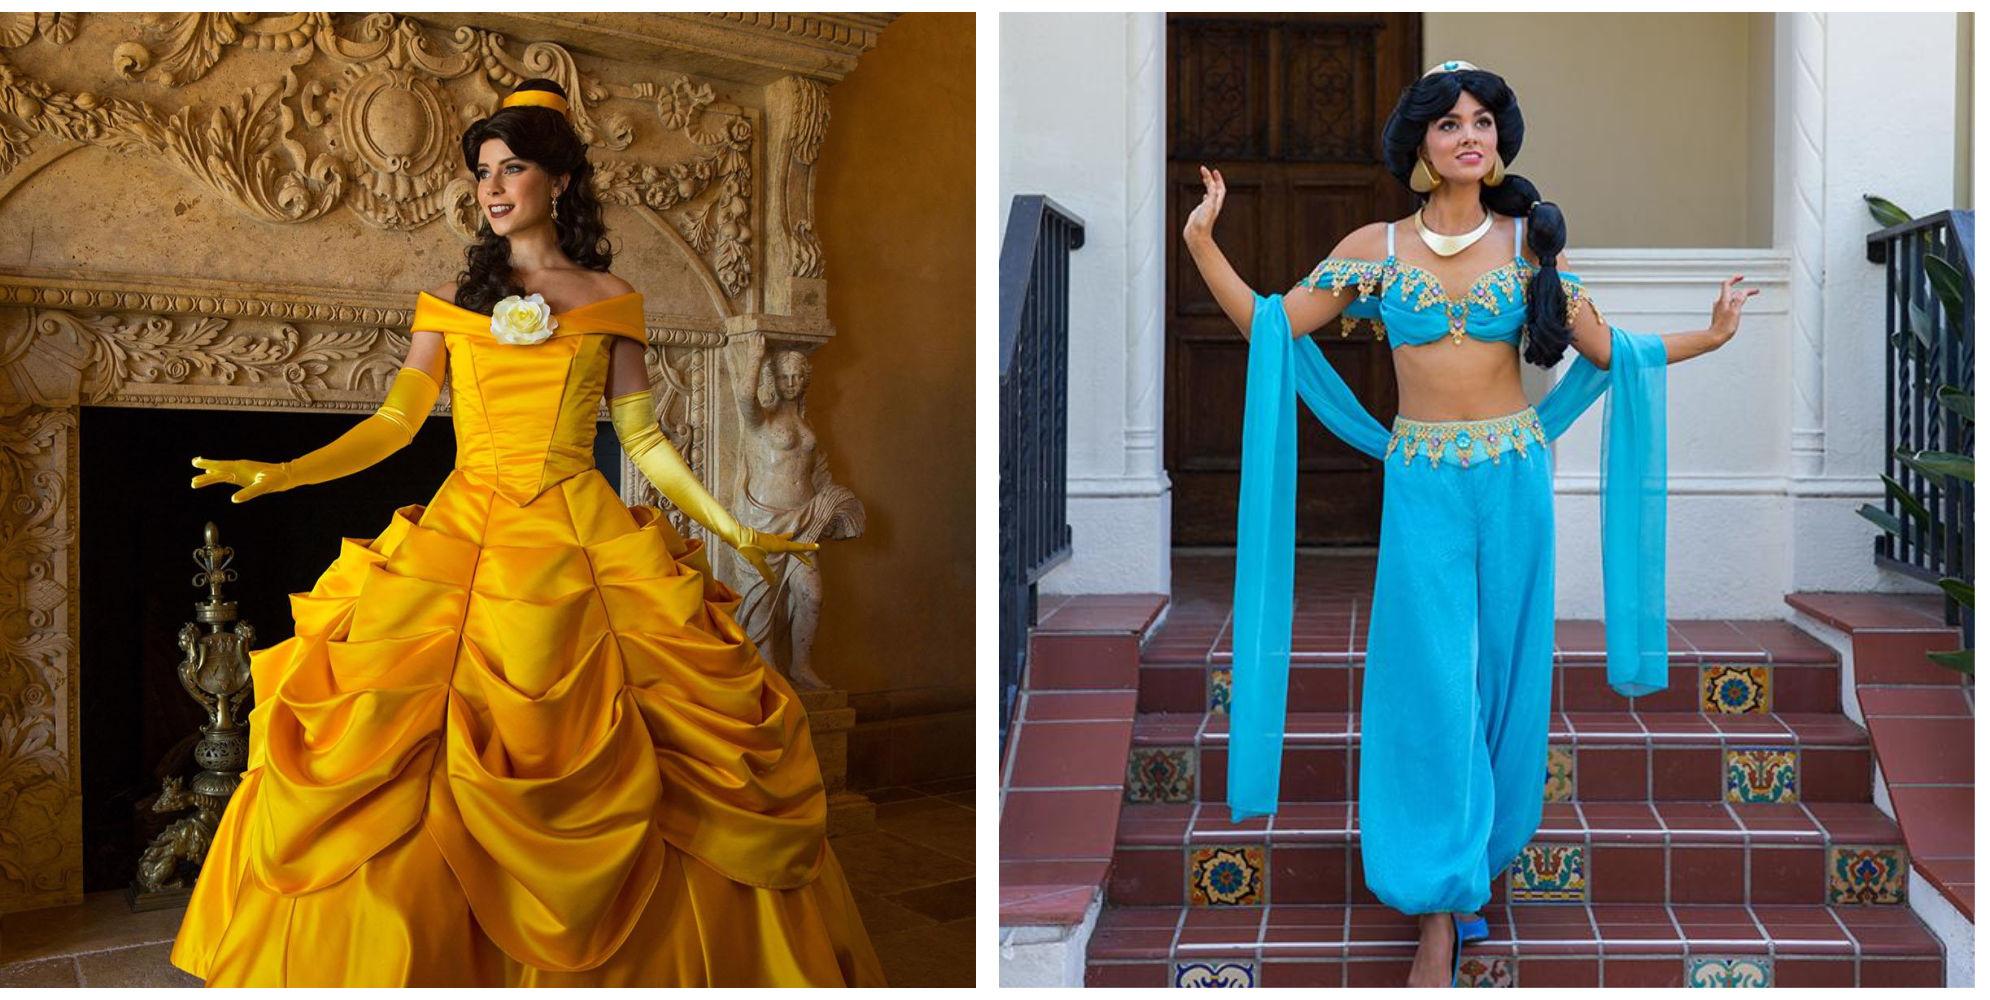 Belle & Jasmine